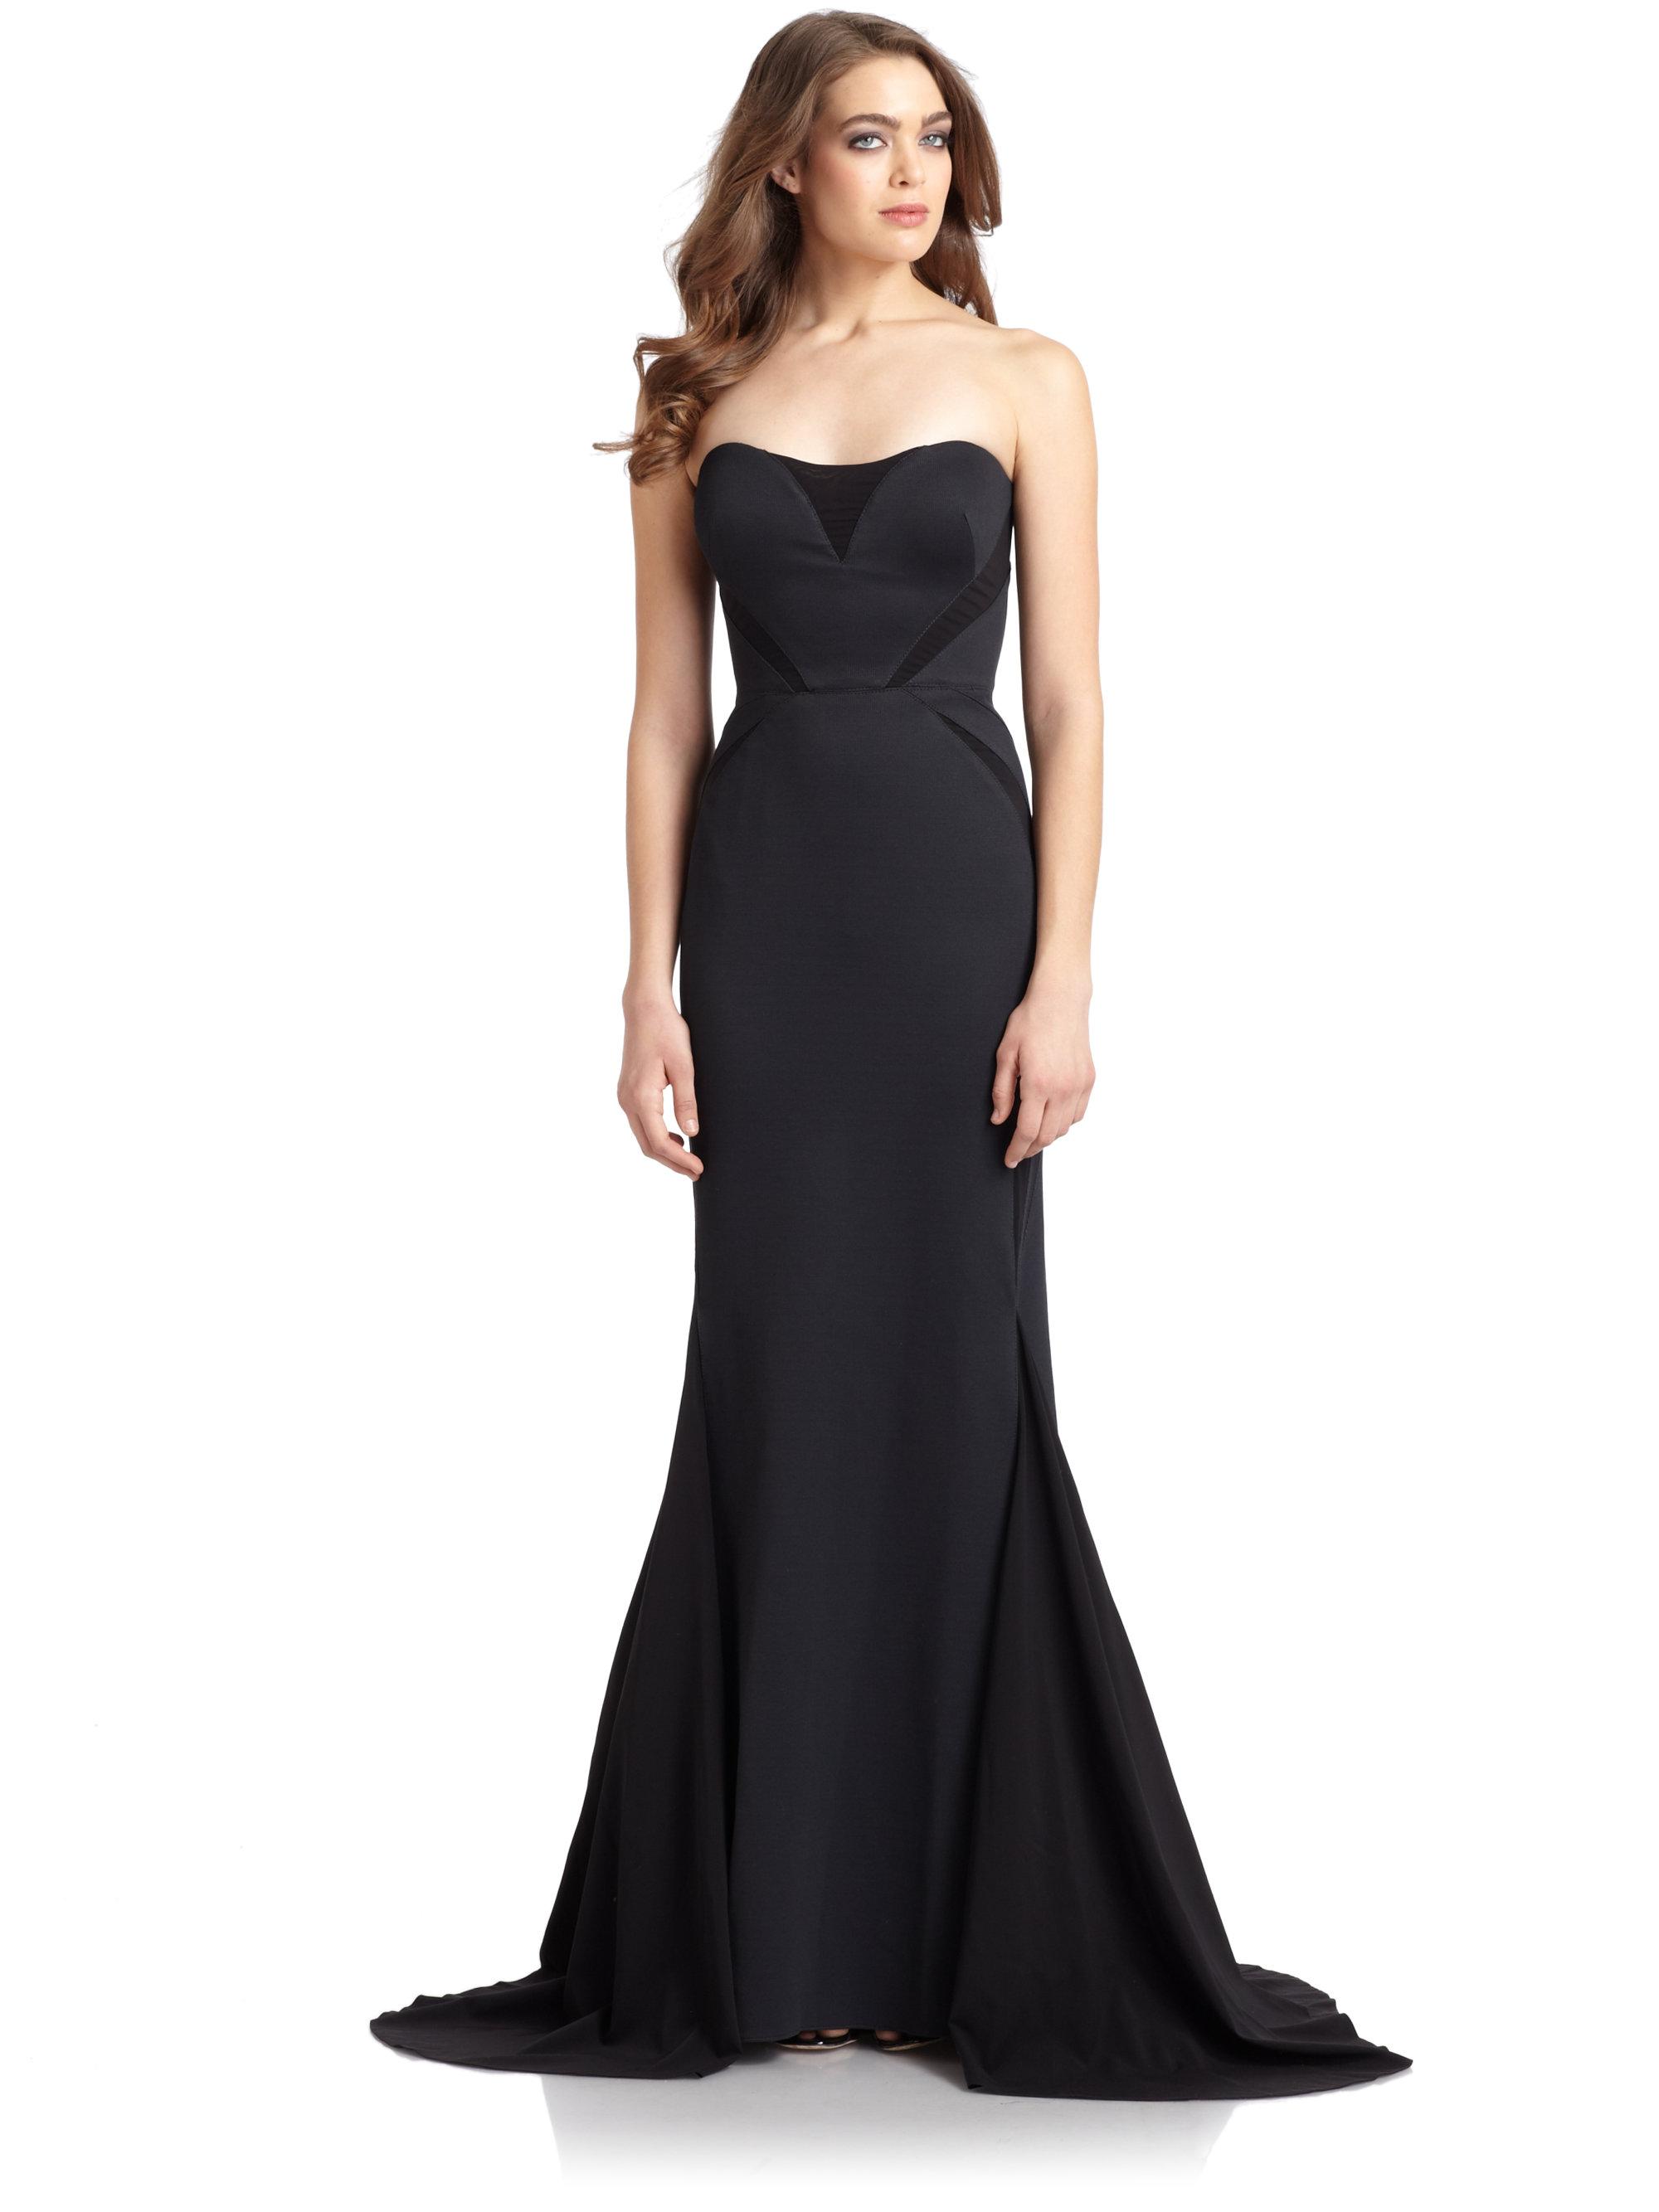 Lyst - Zac Posen Strapless Chiffon Inset Bondage Jersey Gown in Black